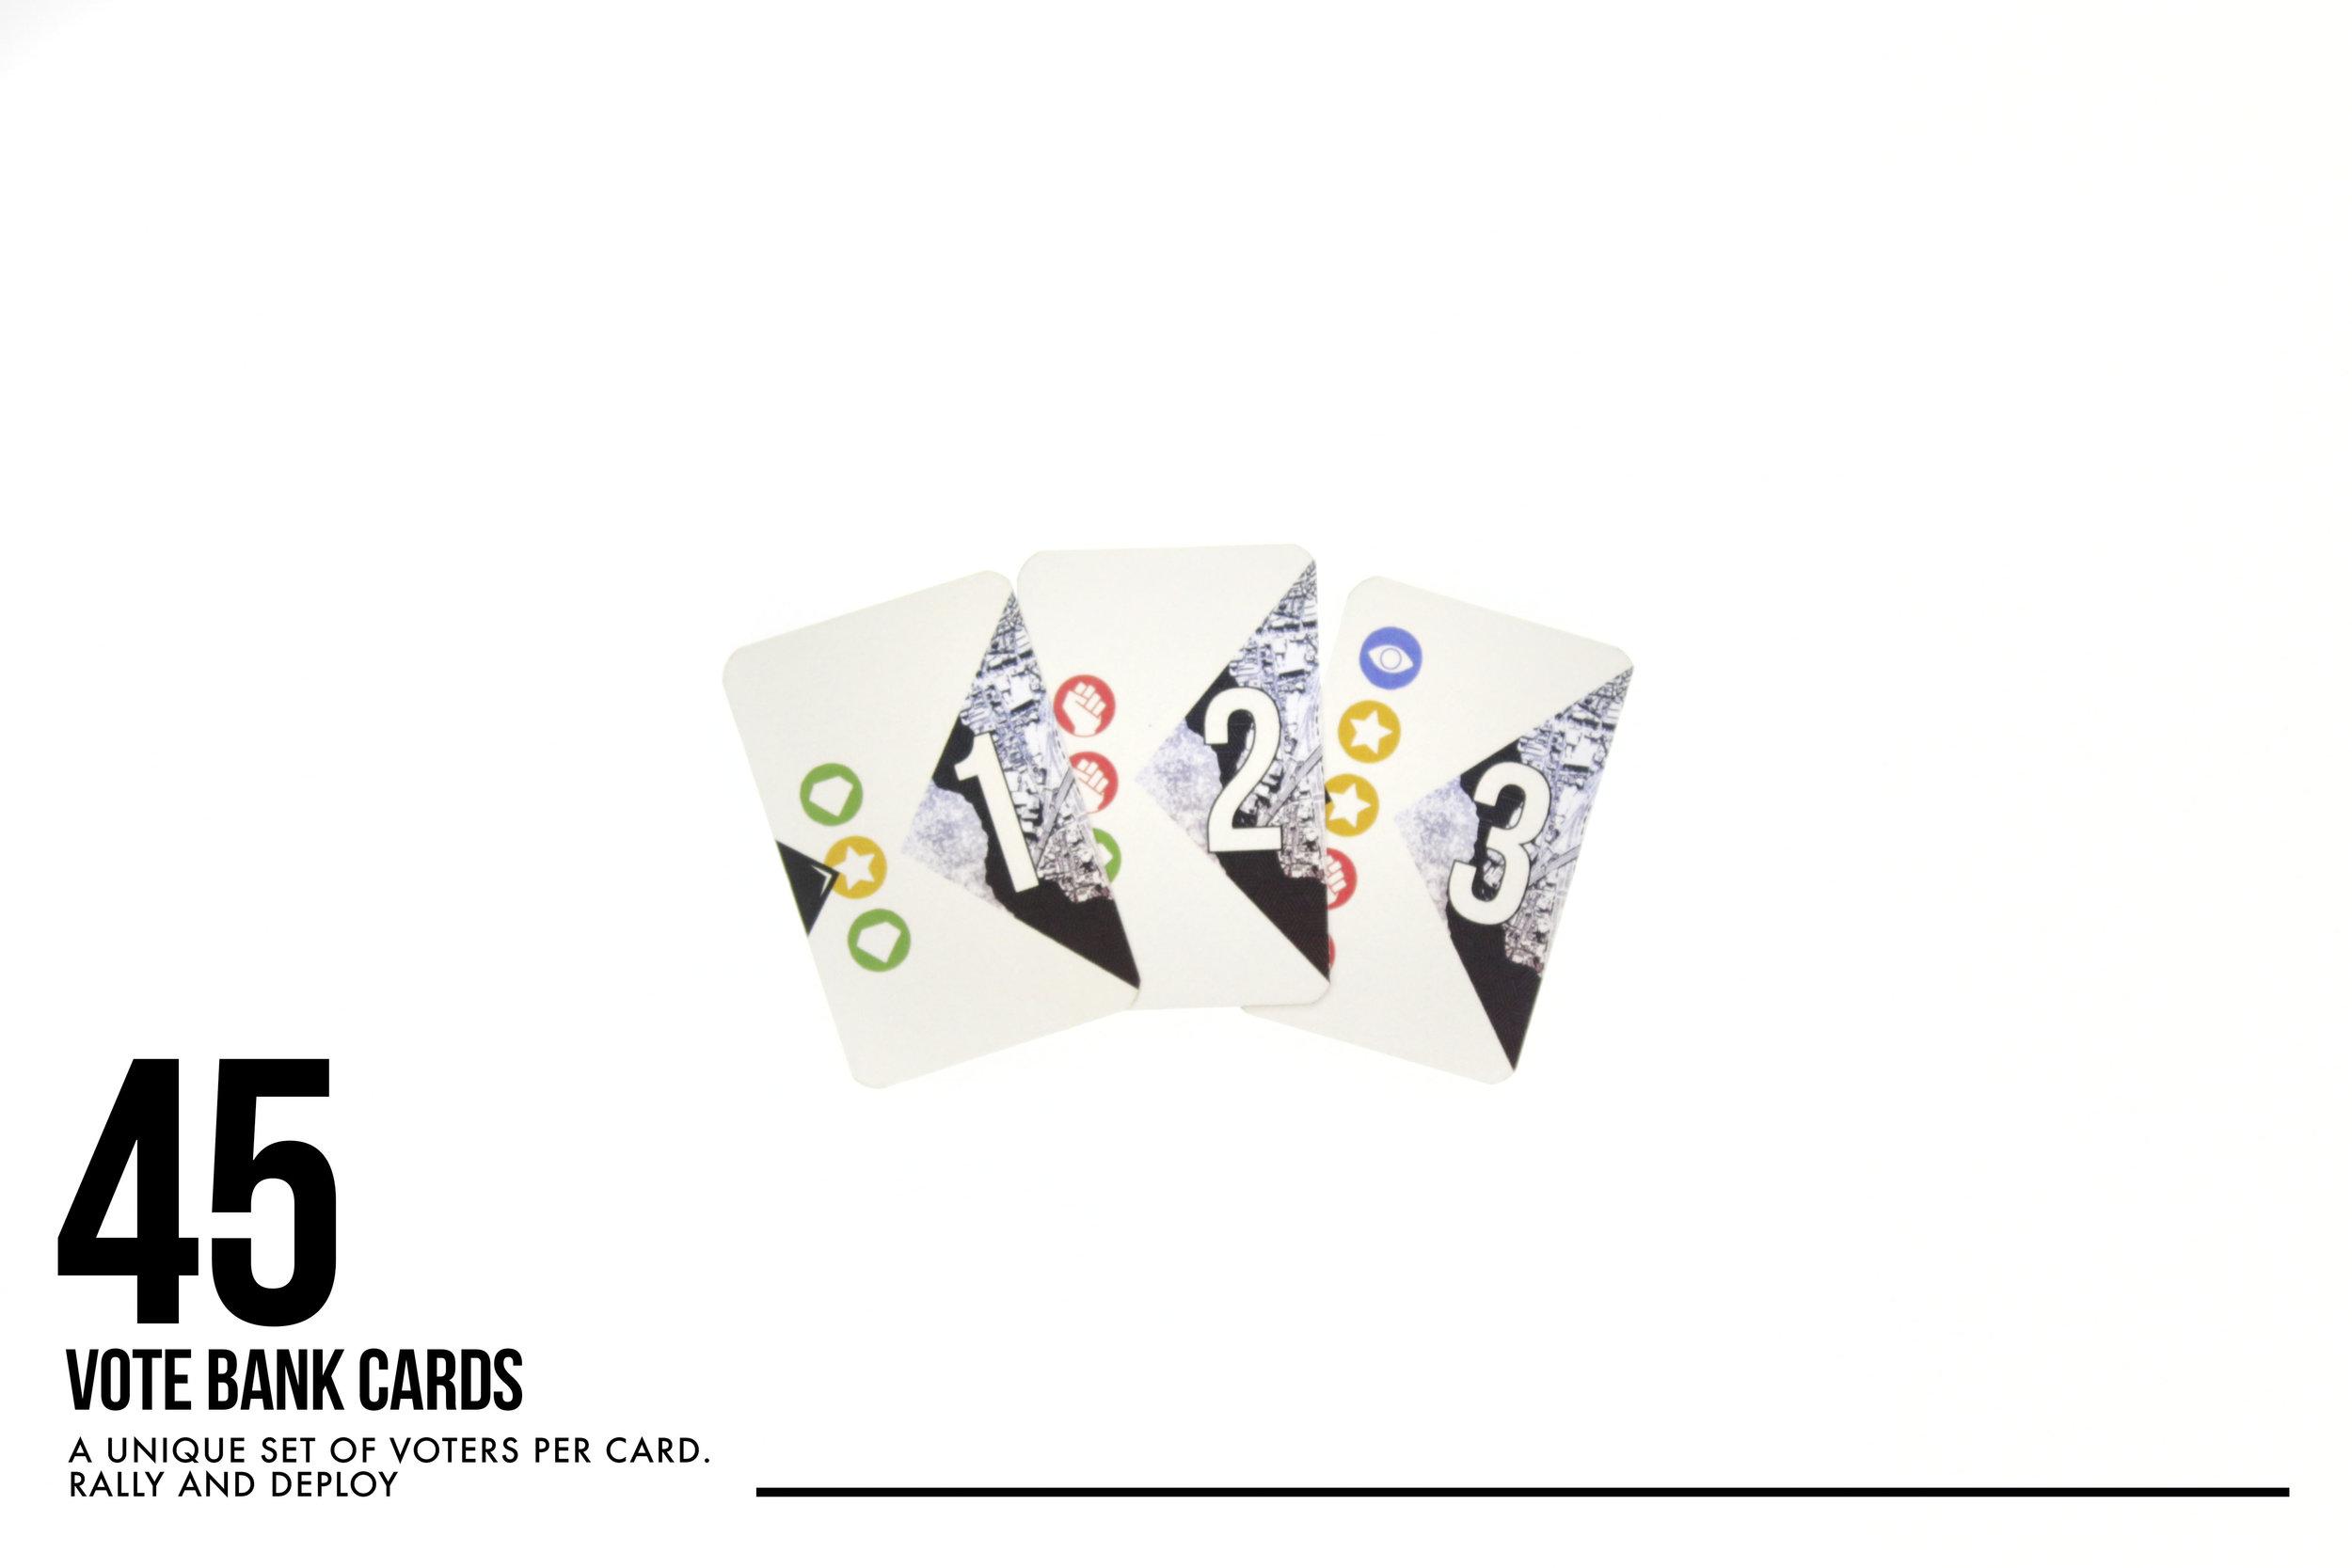 votebank cards.jpg